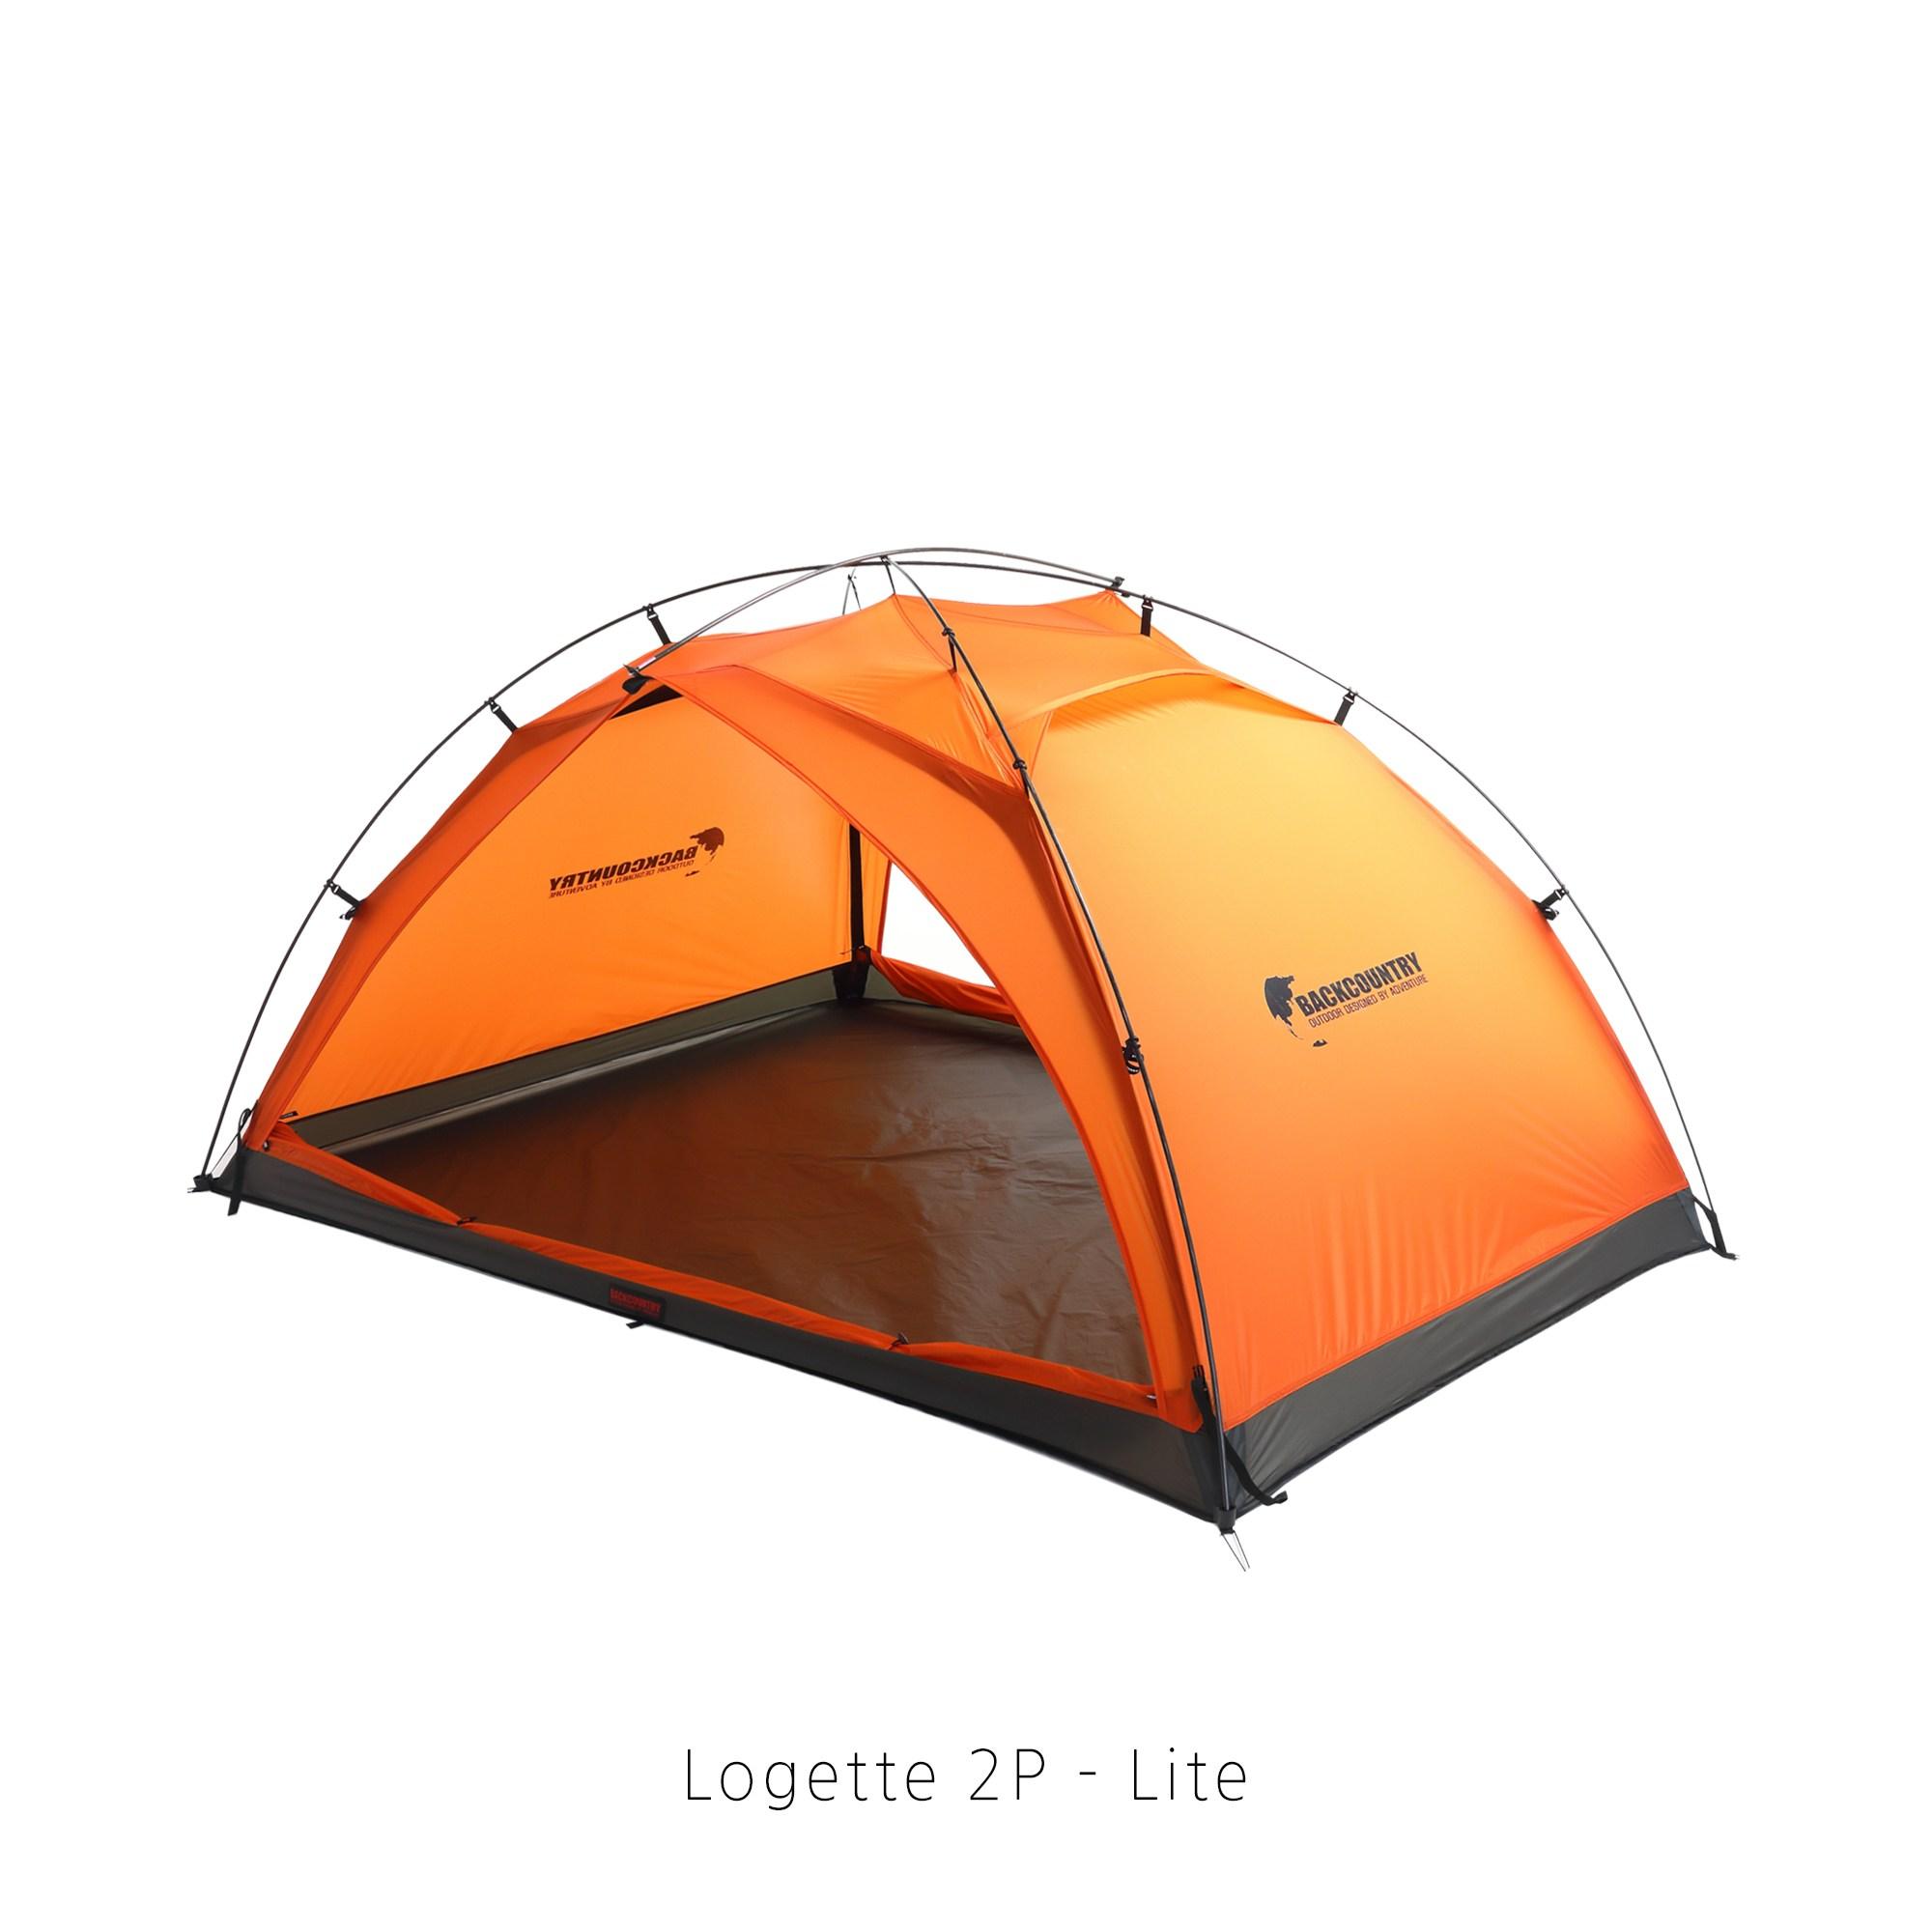 [BACKCOUNTRY] (종합) 재너두2P 와이드 BLT 2P 백패킹 초경량 텐트 제너두 더블월 2P, 3.비엘티 2P(크로마 오렌지)